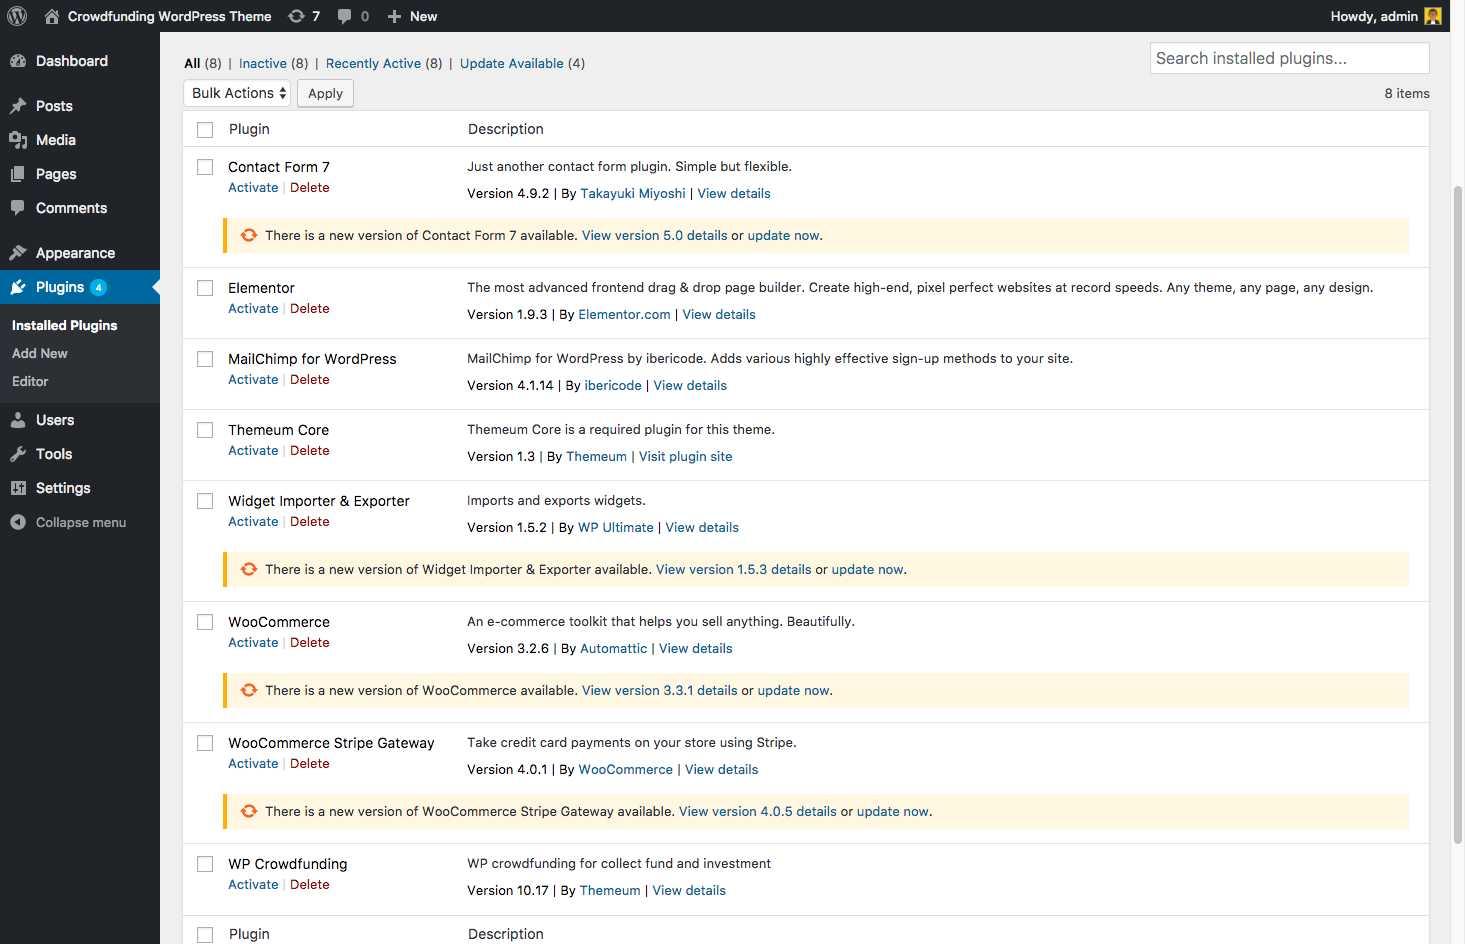 WordPress crowdfunding theme